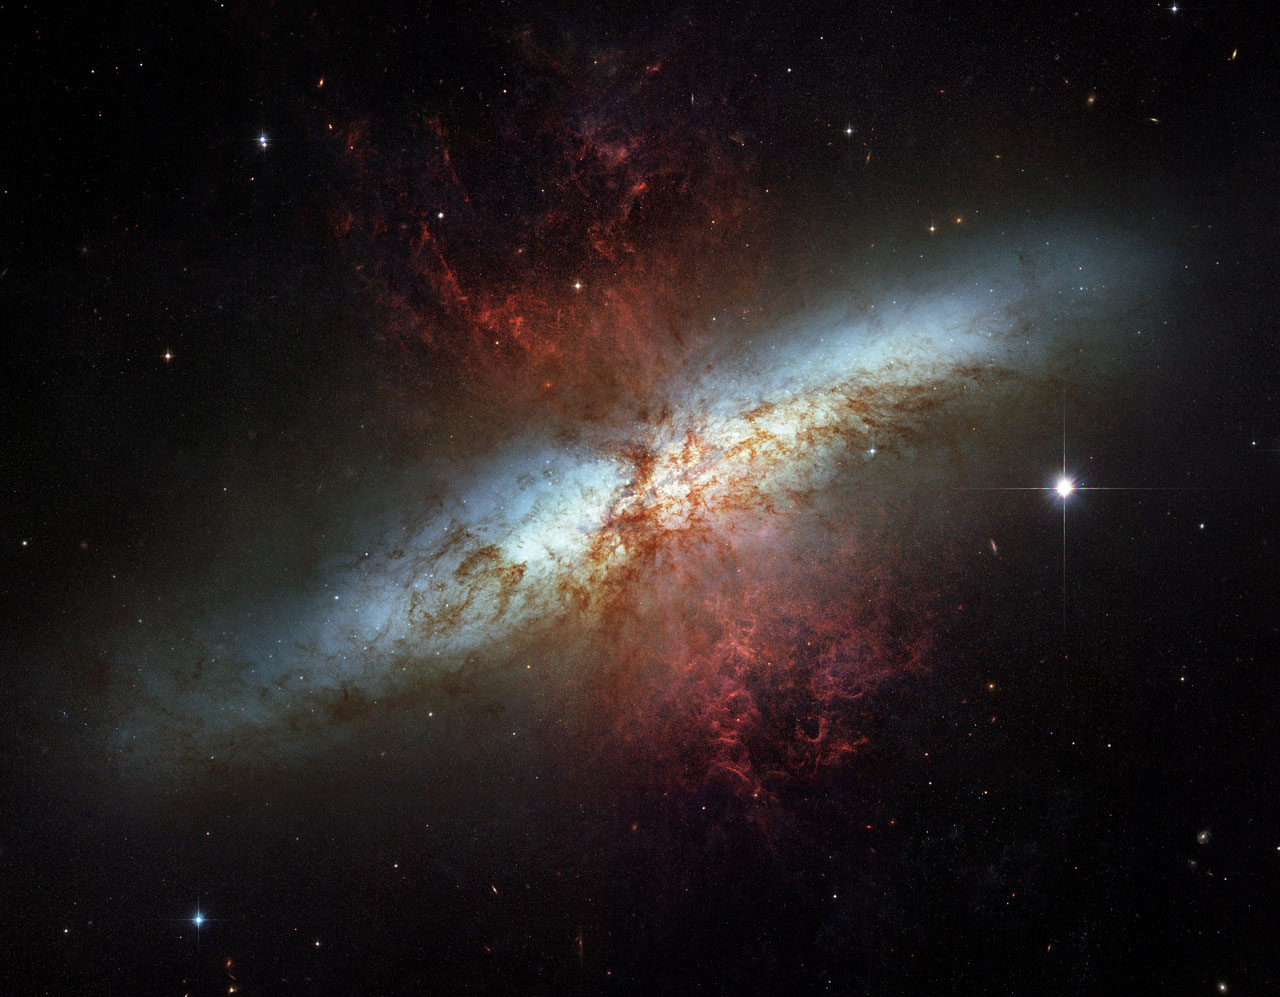 The magnificent starburst galaxy Messier 82 ESAHubble 1280x997